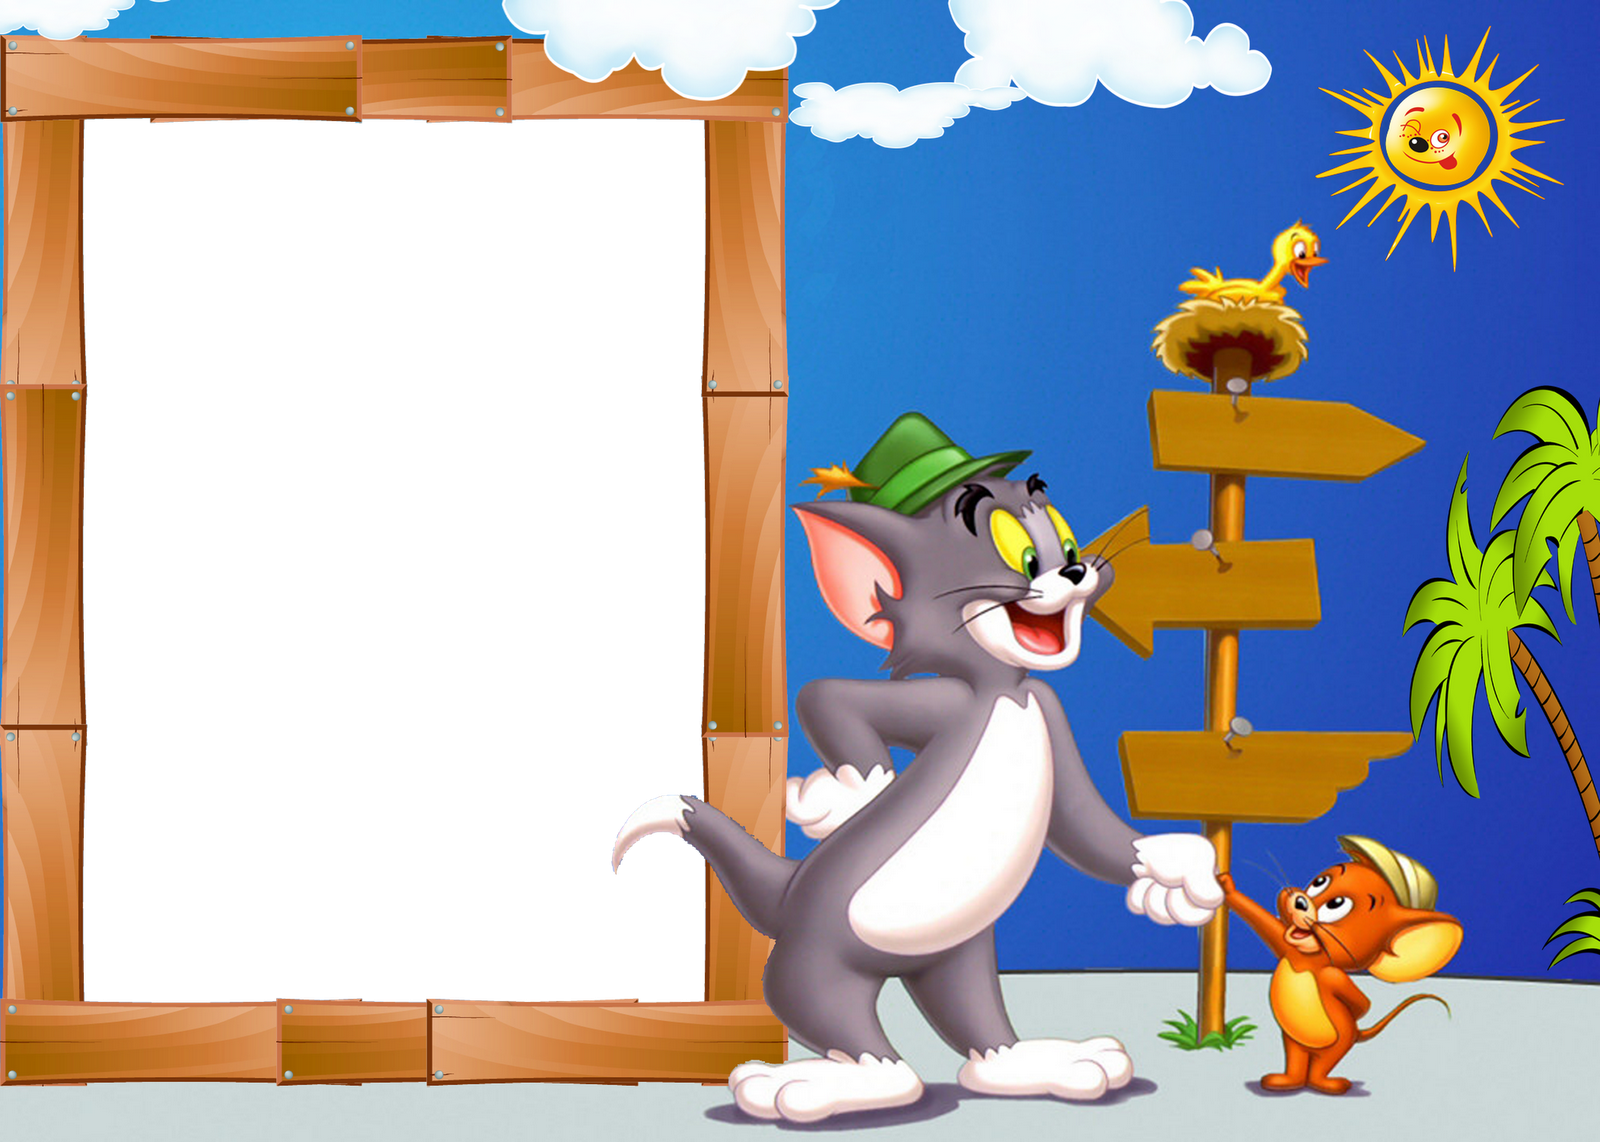 tom jerry frame png | Tom & Jerry birthday ideas | Pinterest ...